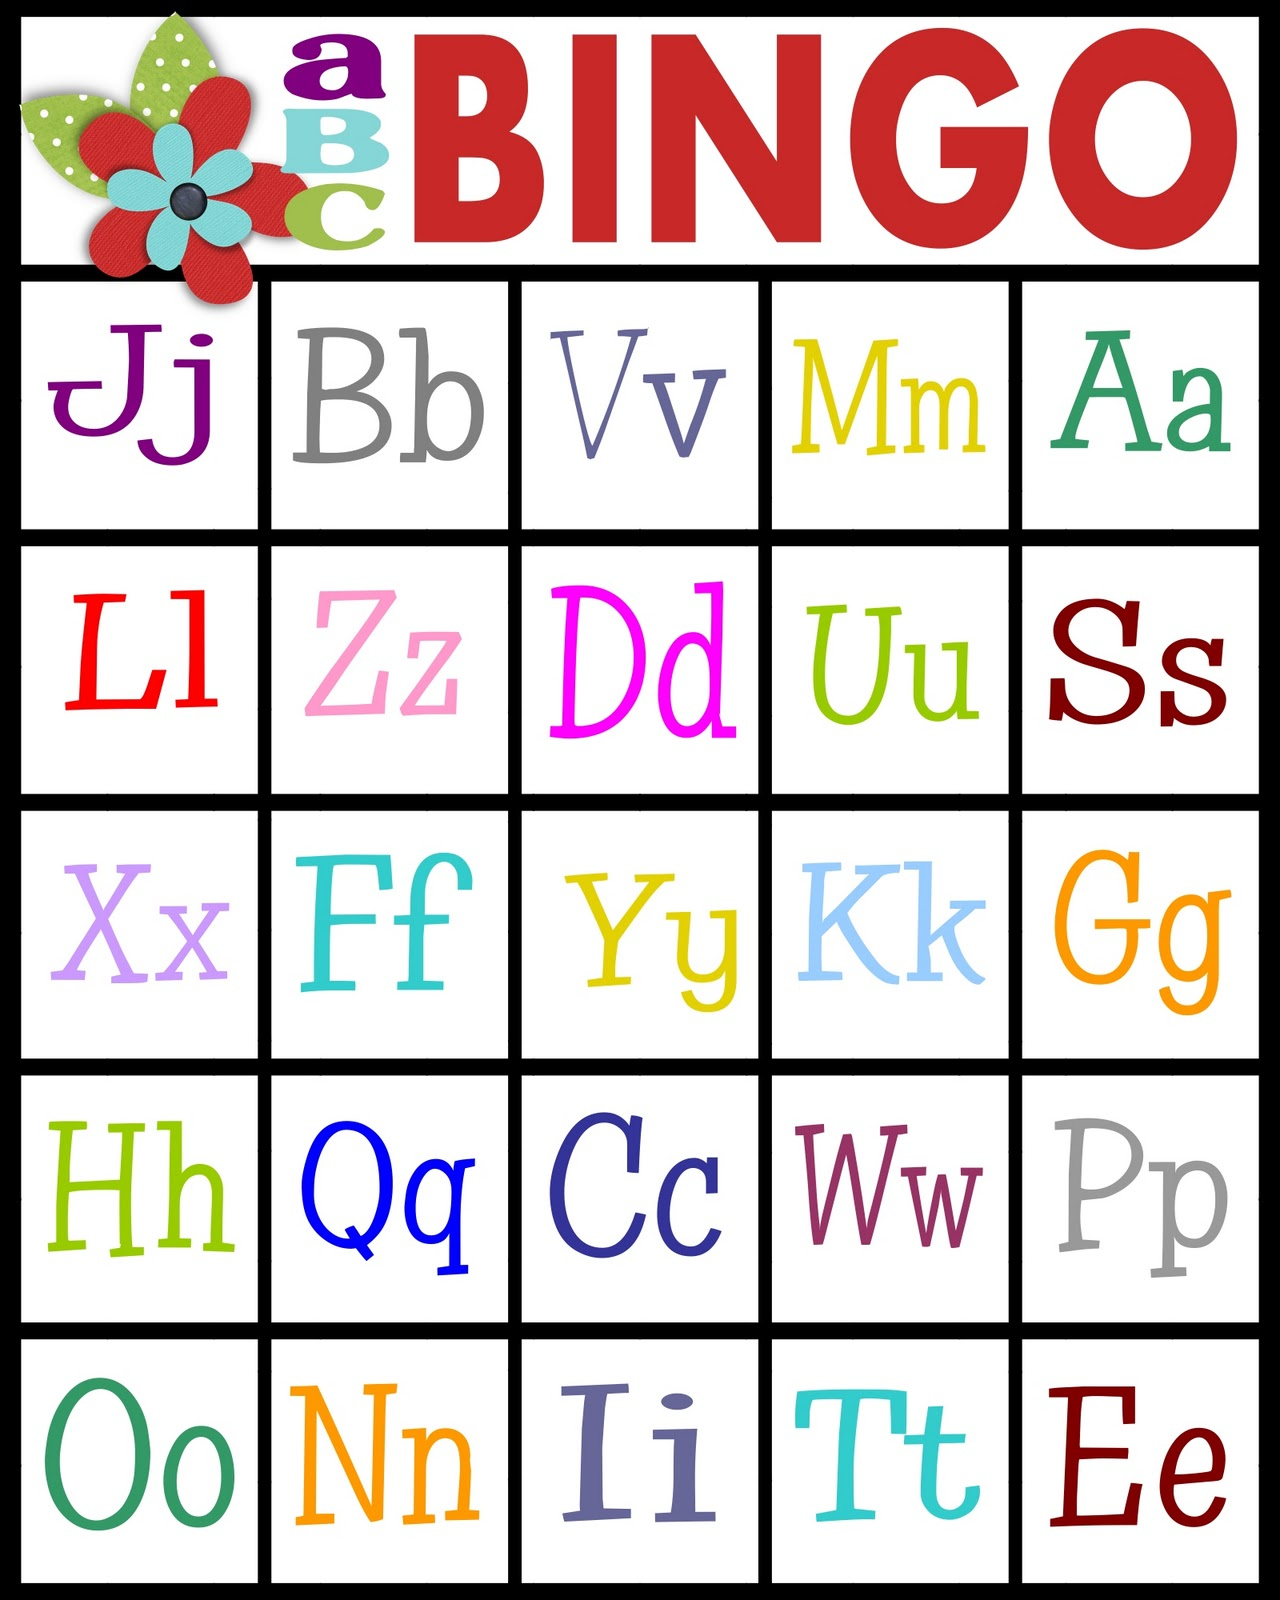 Abc Bingo | 4Peatssake - Free Printable Bingo Cards 1 100